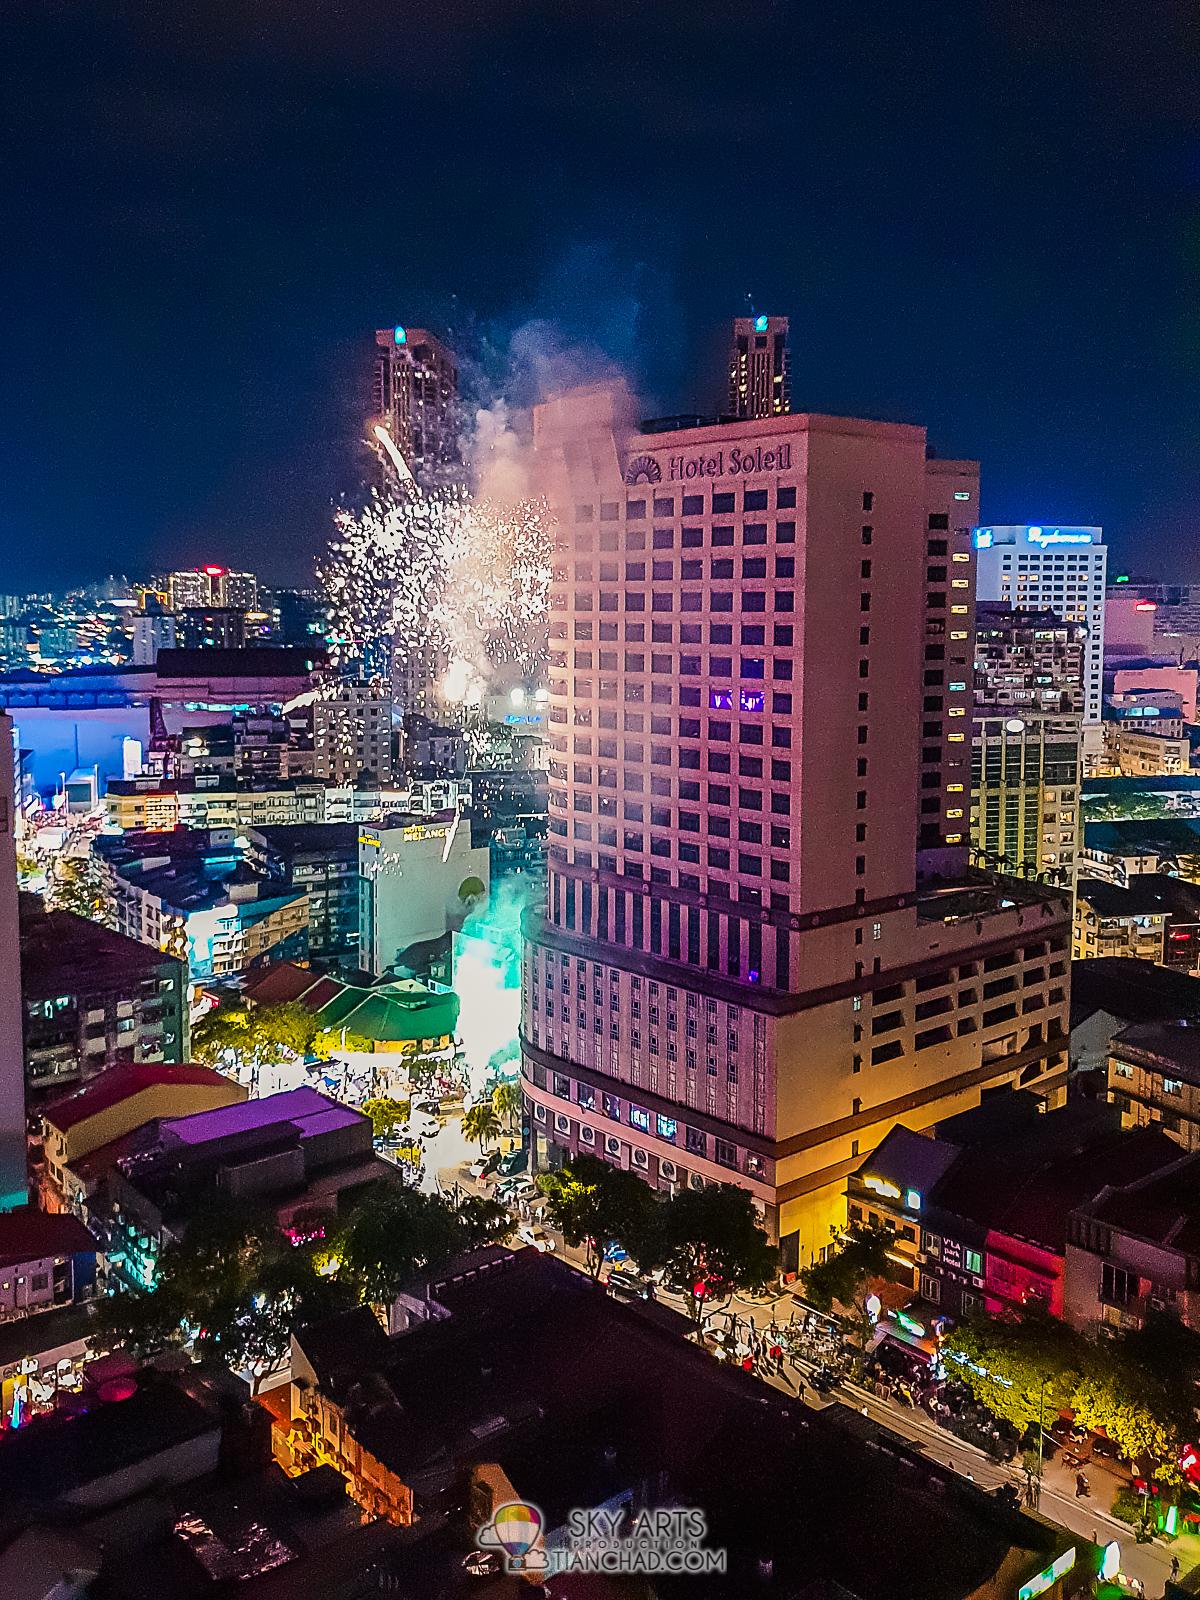 19d618e868d620 Fireworks on Aug 31st night celebrating Merdeka at Changkat Bukit Bintang